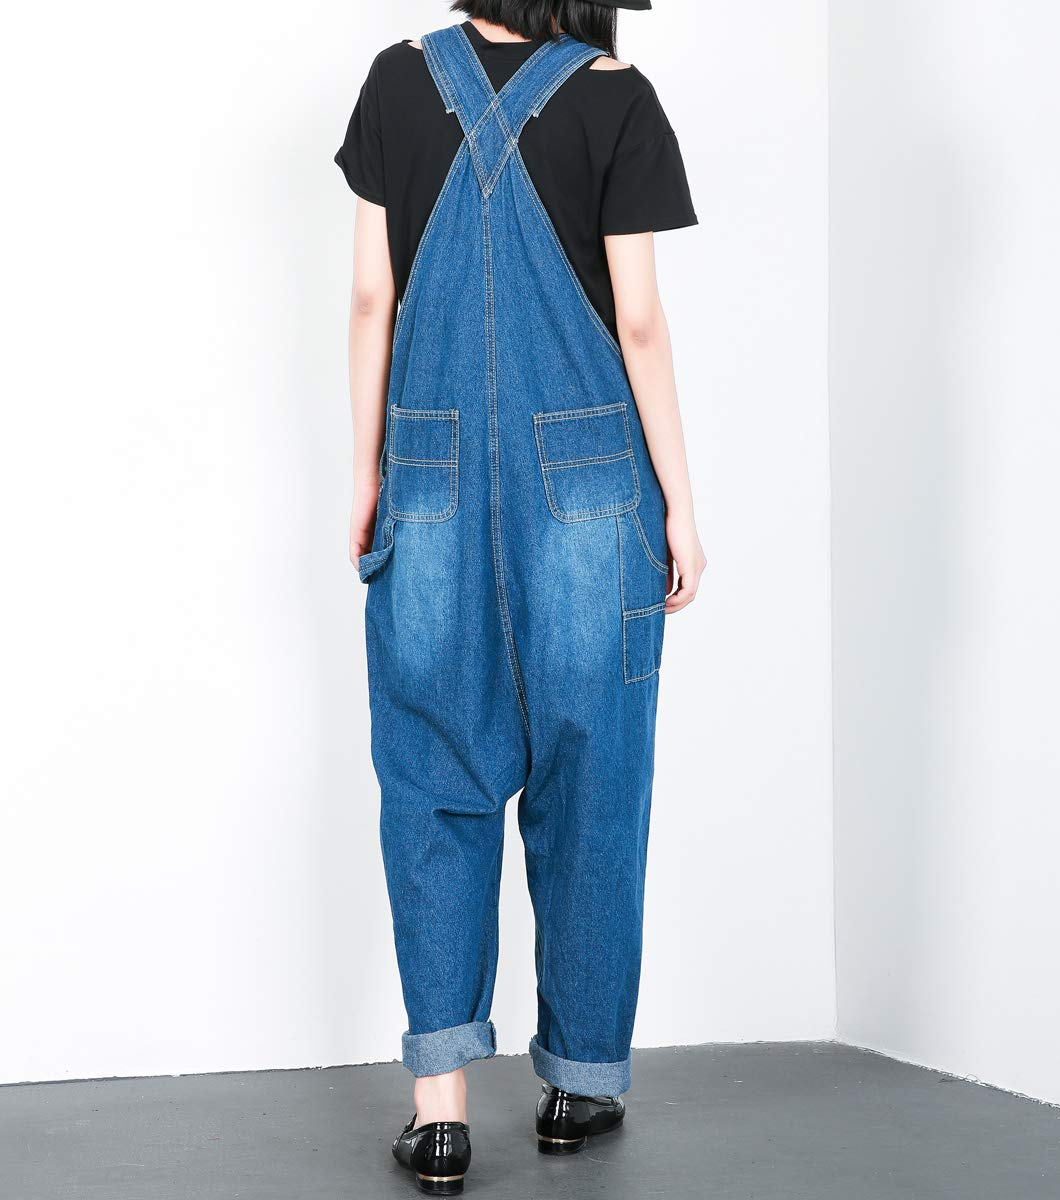 e0f8f4f5fbb ELLAZHU Women Fashion Adjustable Strap Pockets Denim Overalls ...